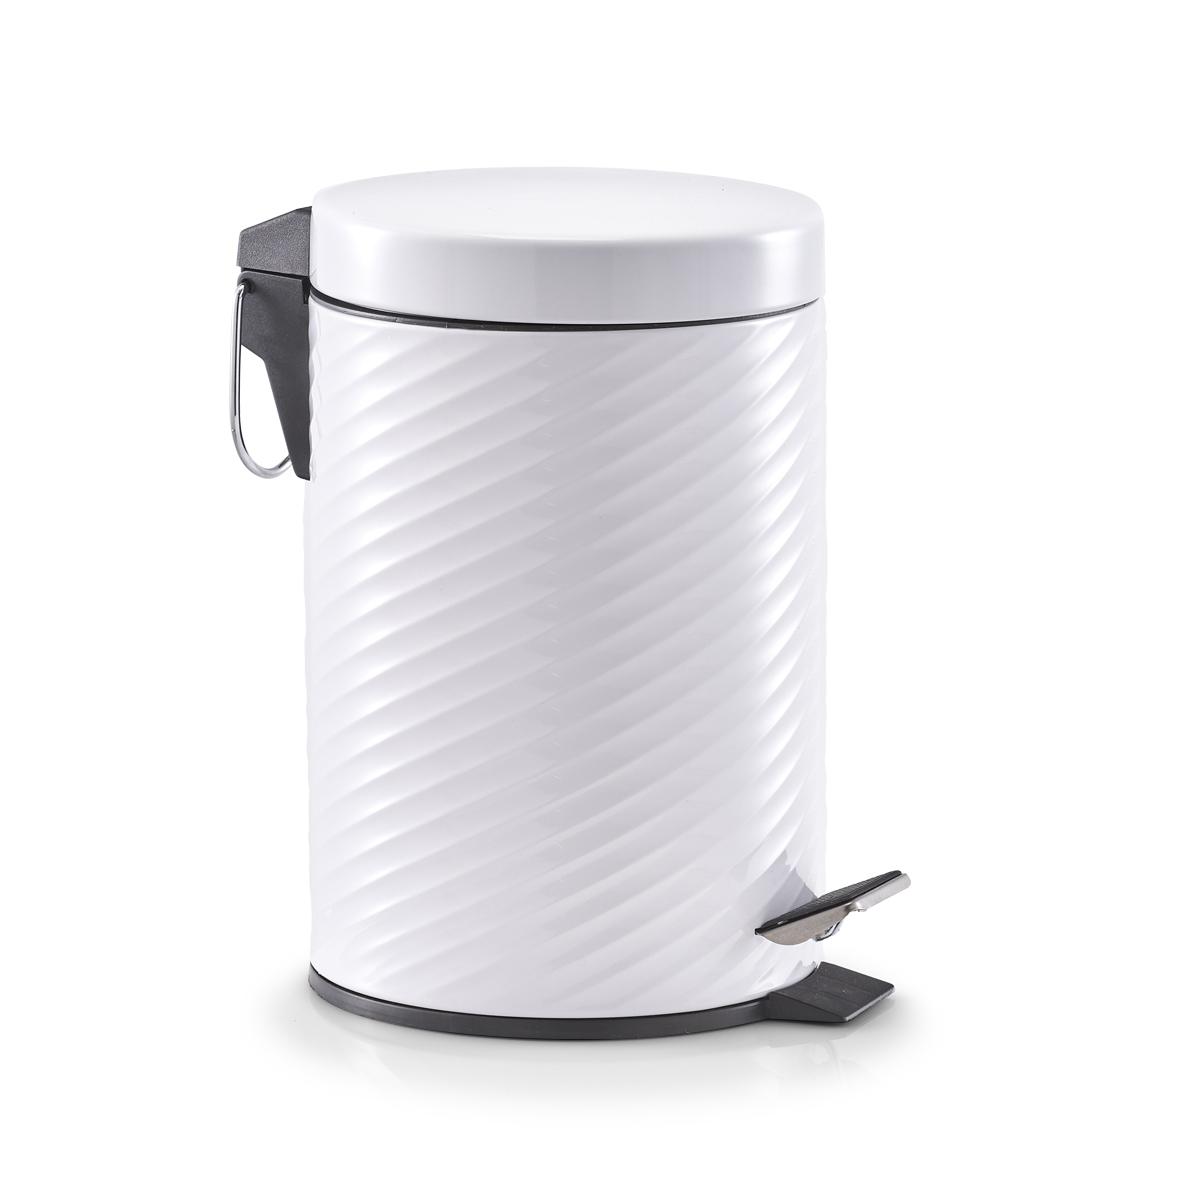 Cos de gunoi cu pedala, Metal Alb, 3L imagine